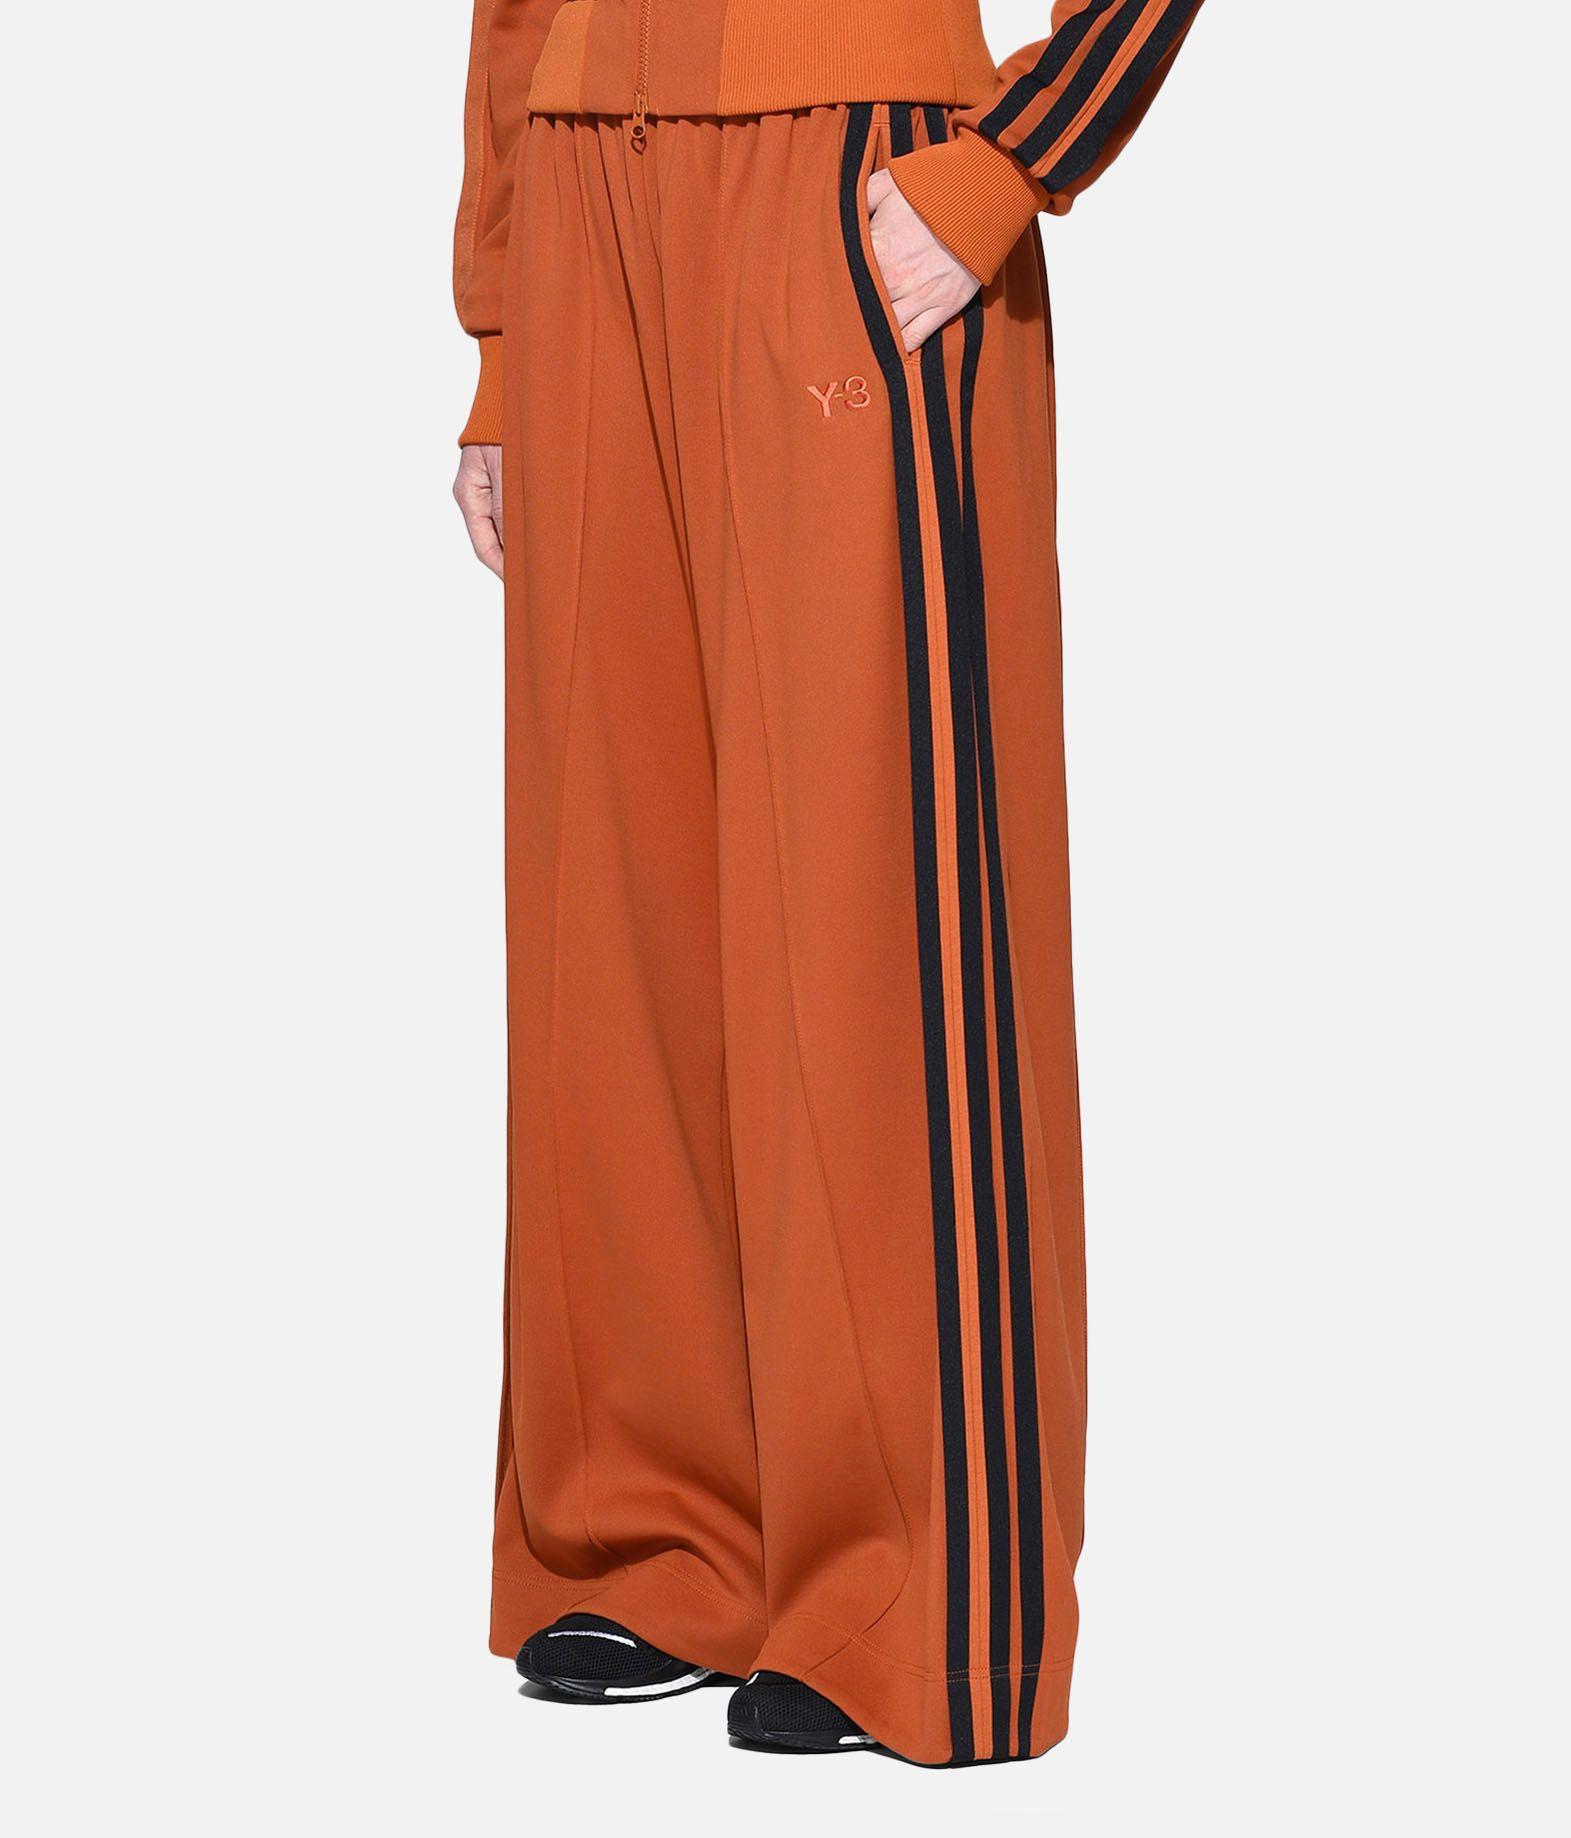 Y-3 Y-3 3-Stripes Selvedge Matte Track Pants Track pant Woman e